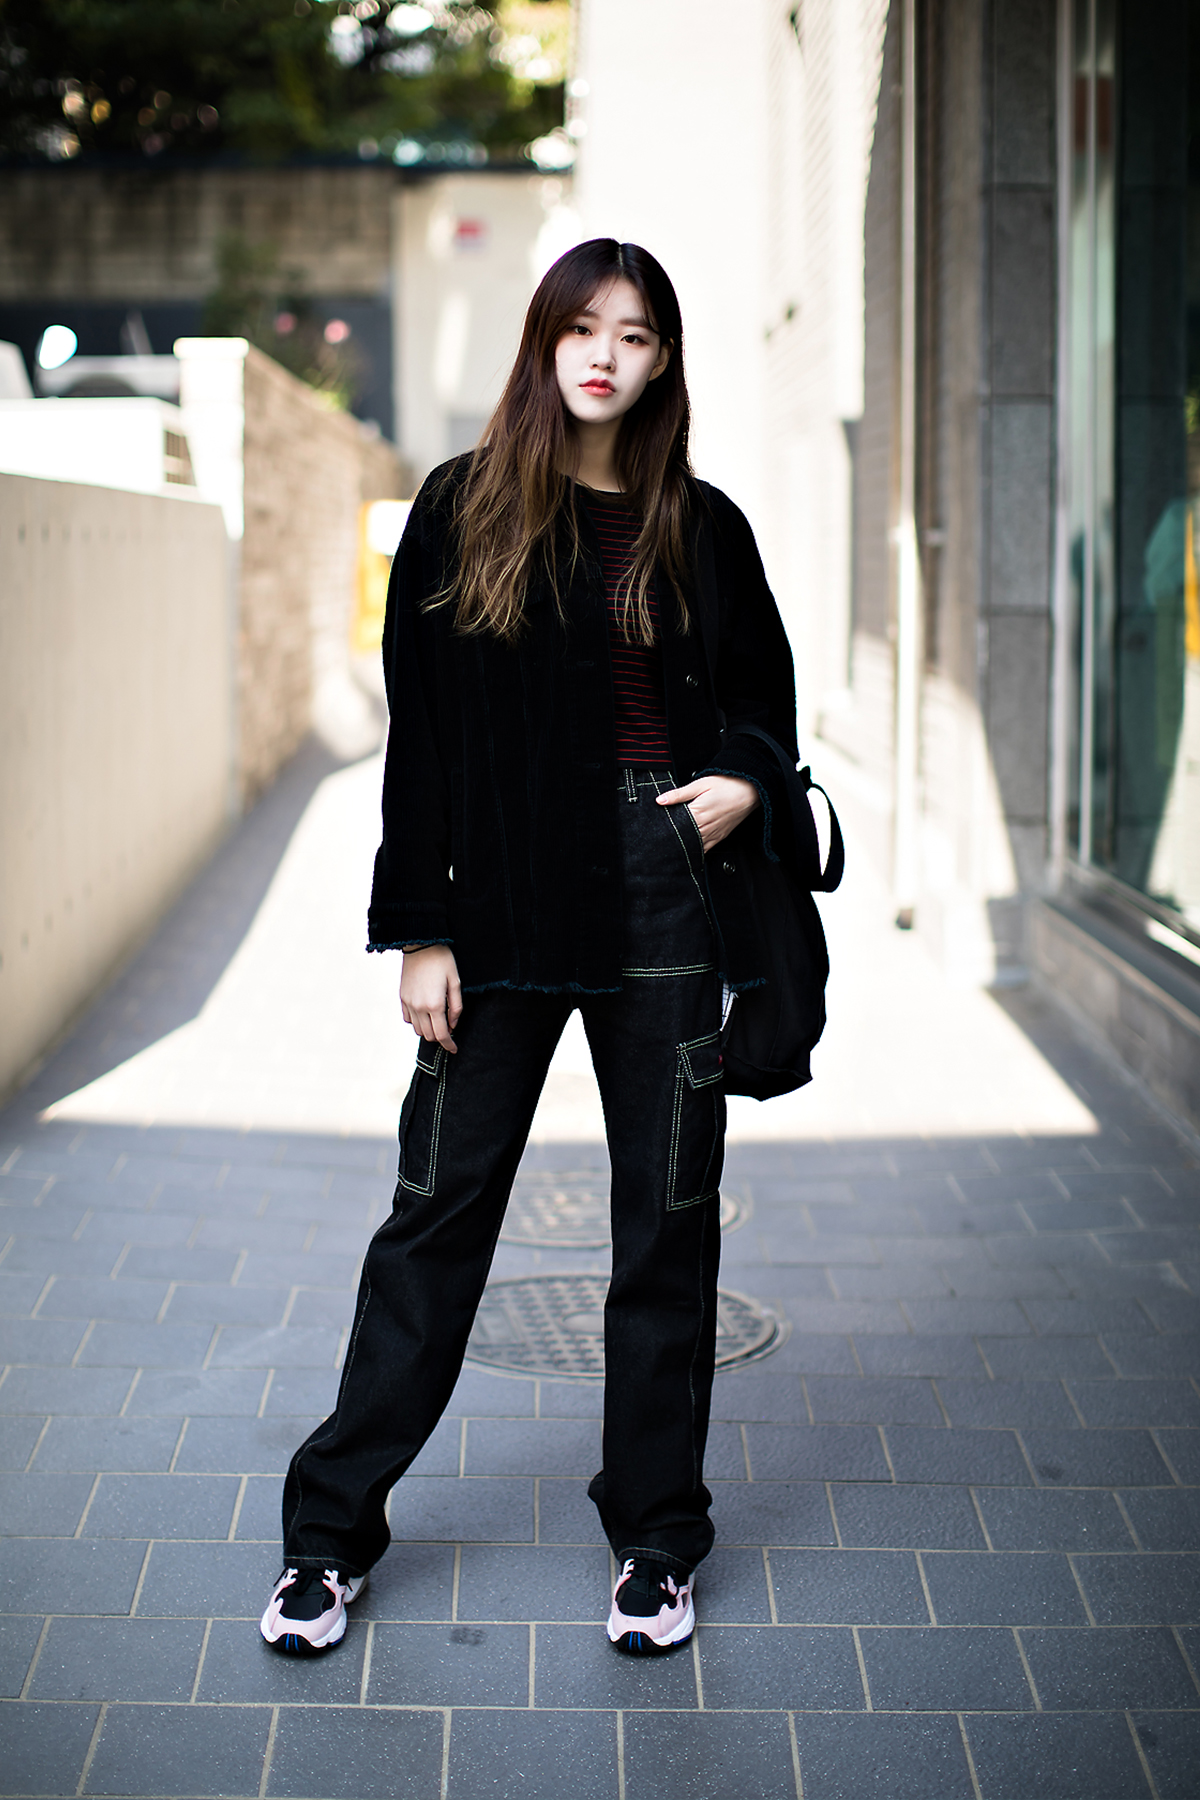 Women fall street style last week of october 2018 inseoul 19